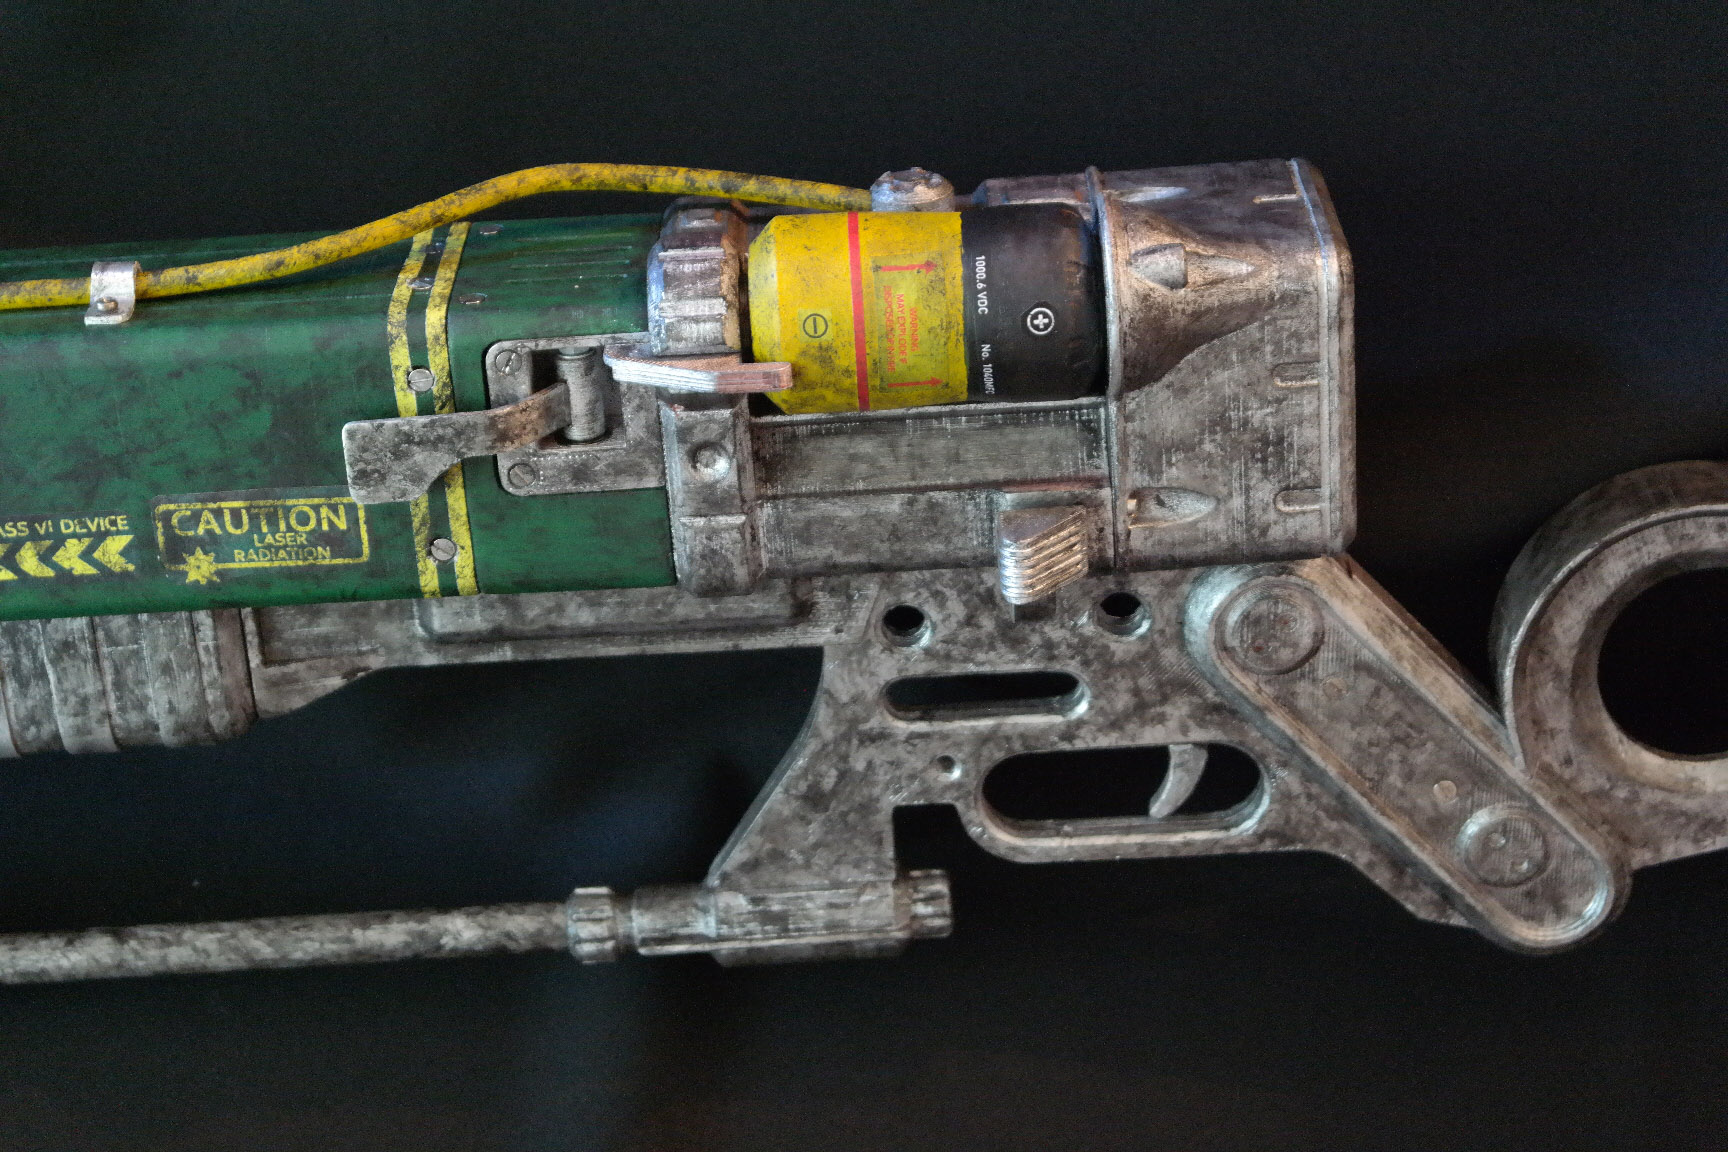 AER9 Laser Rifle – Ytec 3D